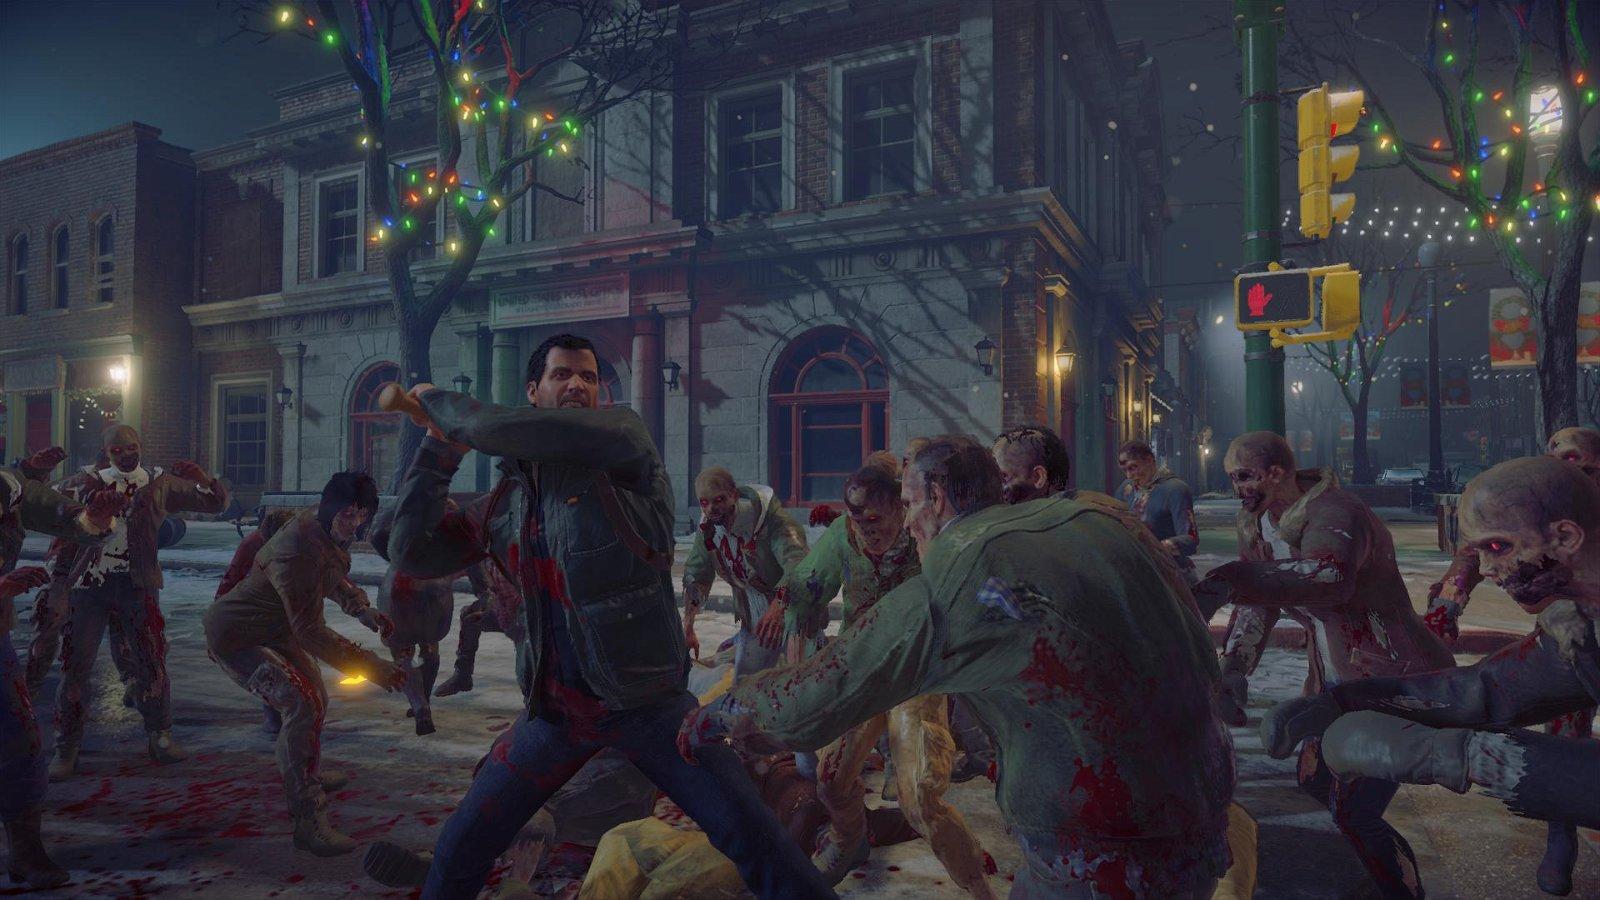 """Dead Rising 4"" Seemingly Confirmed, New Screenshots Leak"